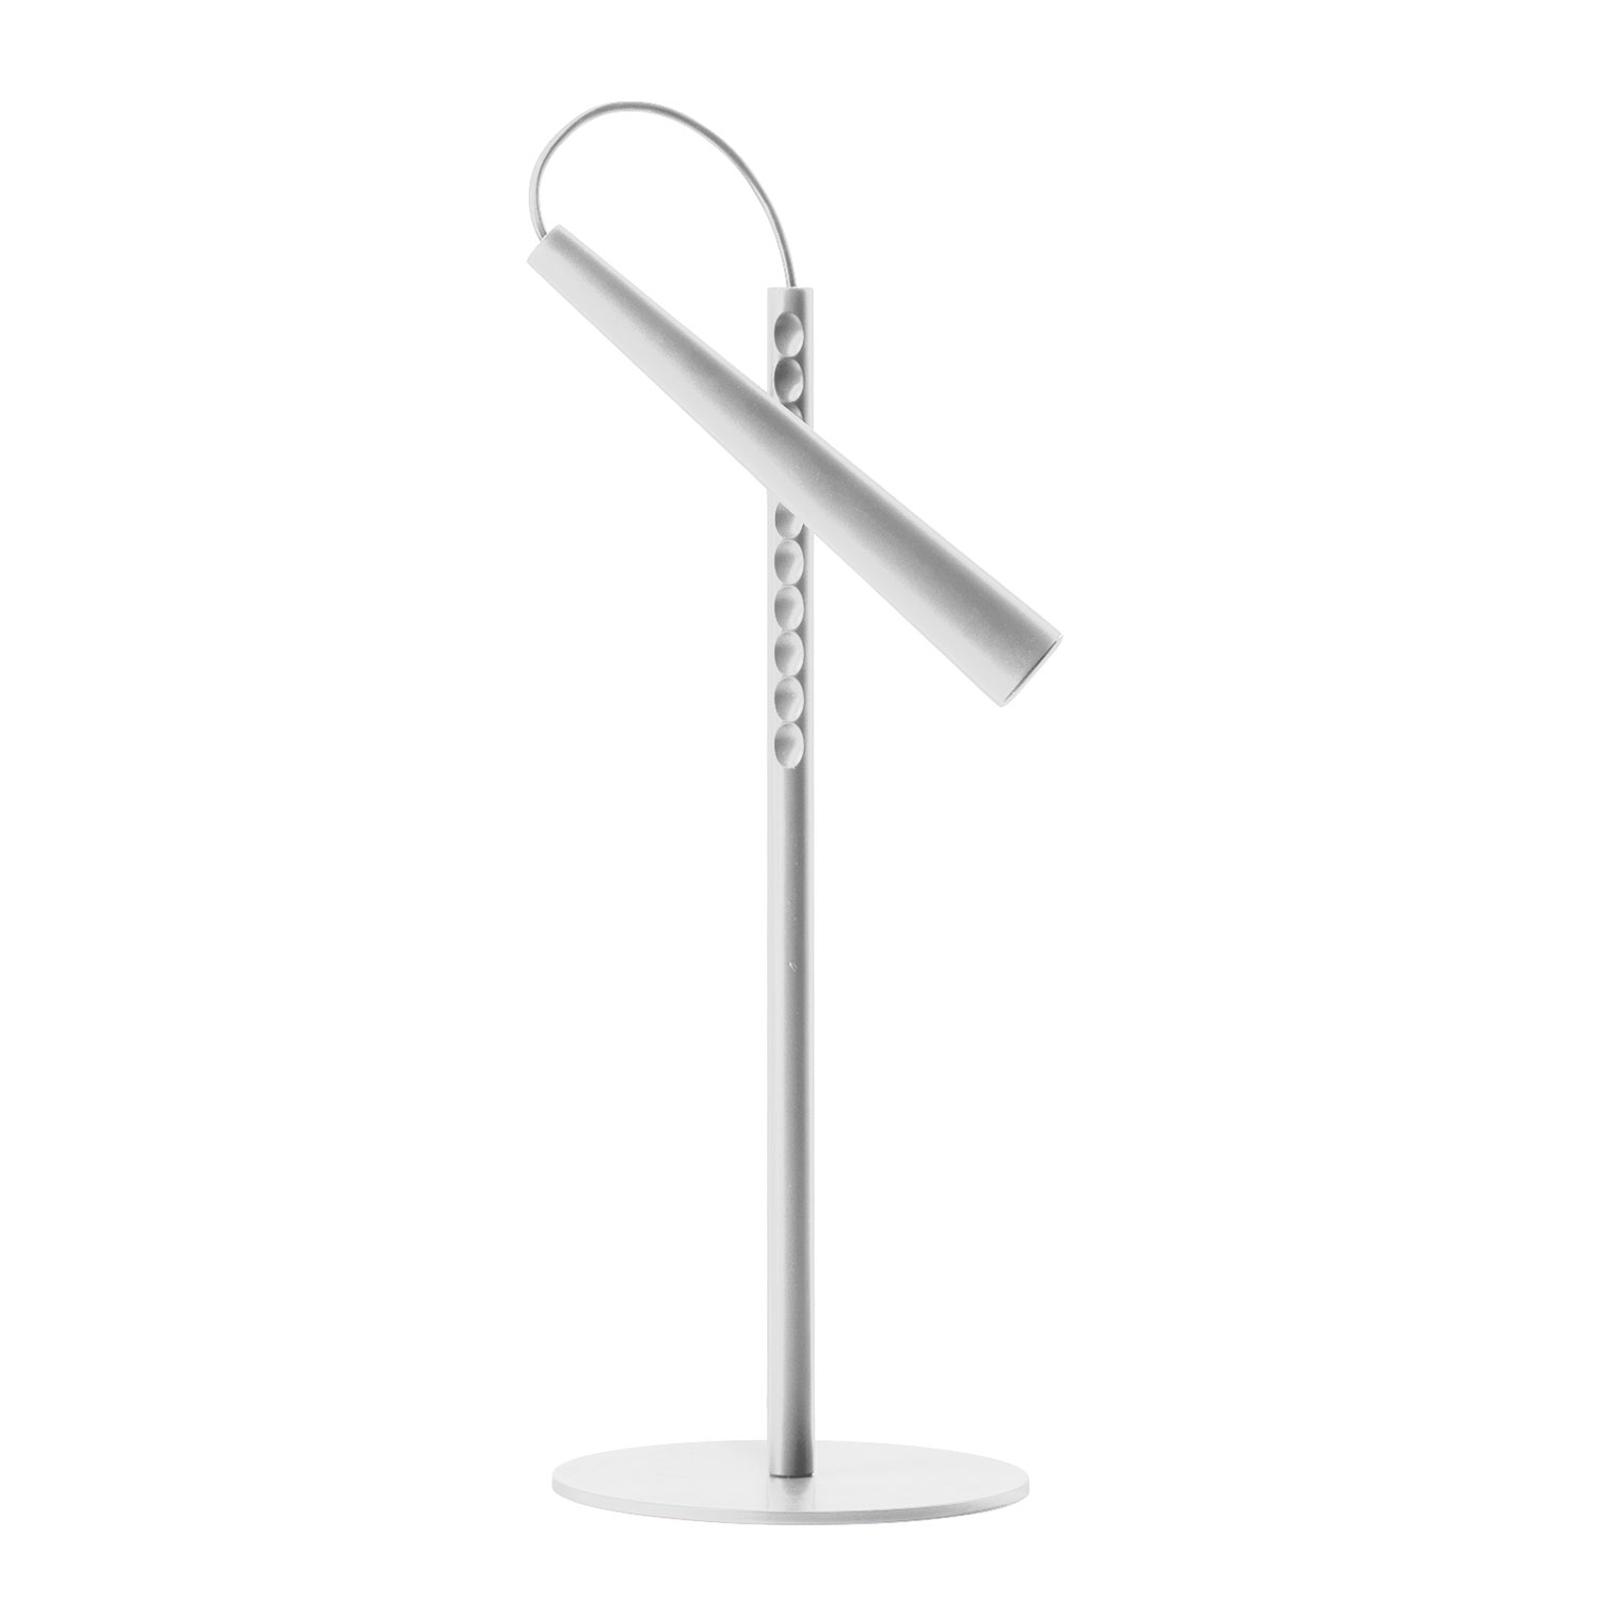 Foscarini Magneto LED-Tischleuchte, weiß